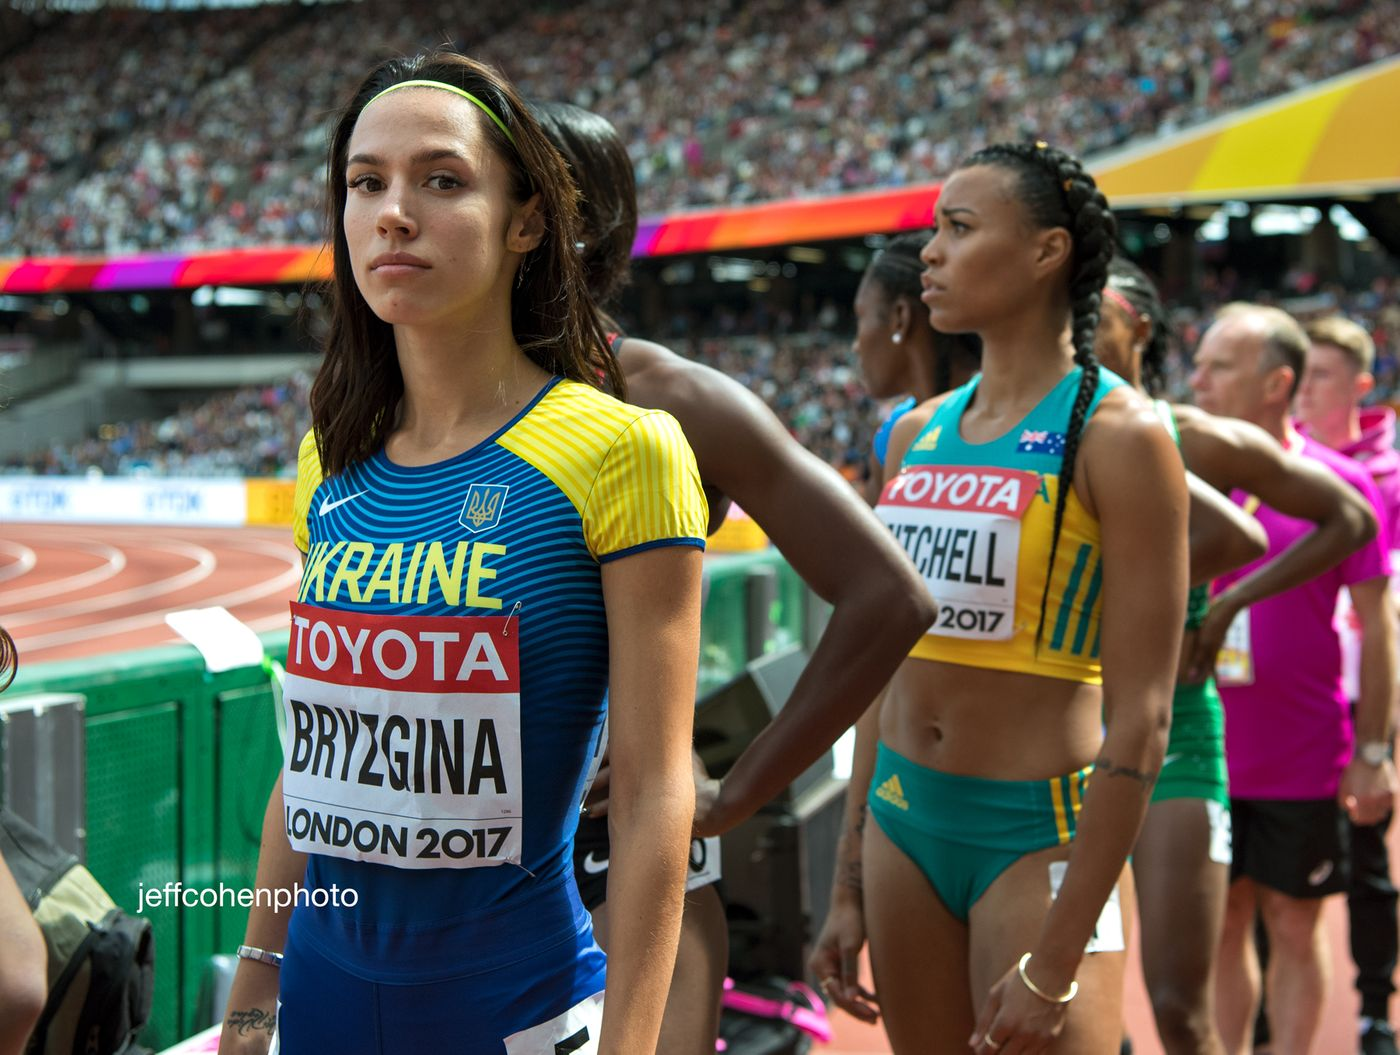 2017-IAAF-WC-London-day-3-Anastasiia-Bryzgina-400m-enter-4262-jeff-cohen-photo--web.jpg